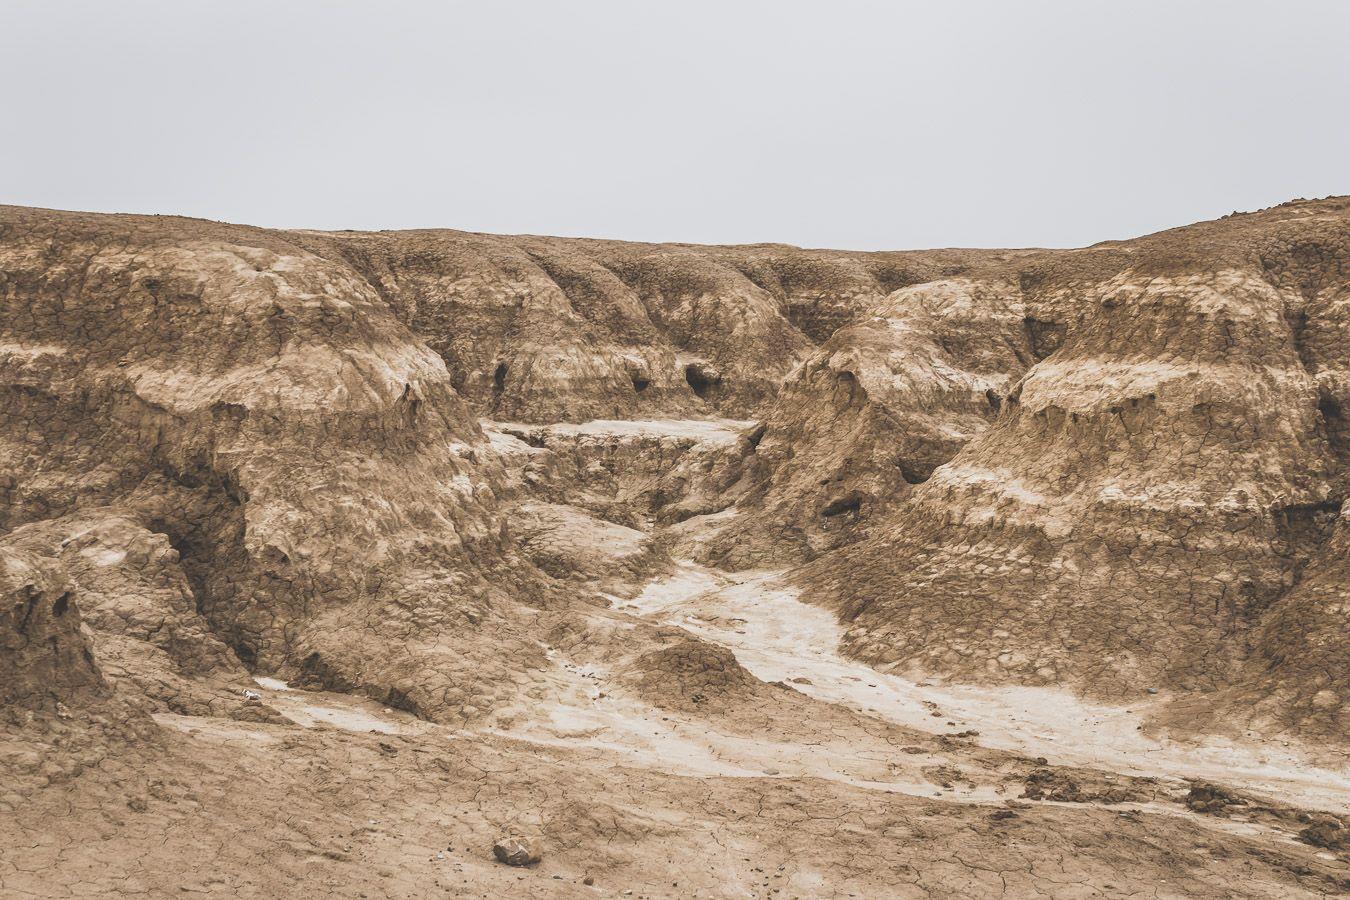 géologie de la nature espagnole